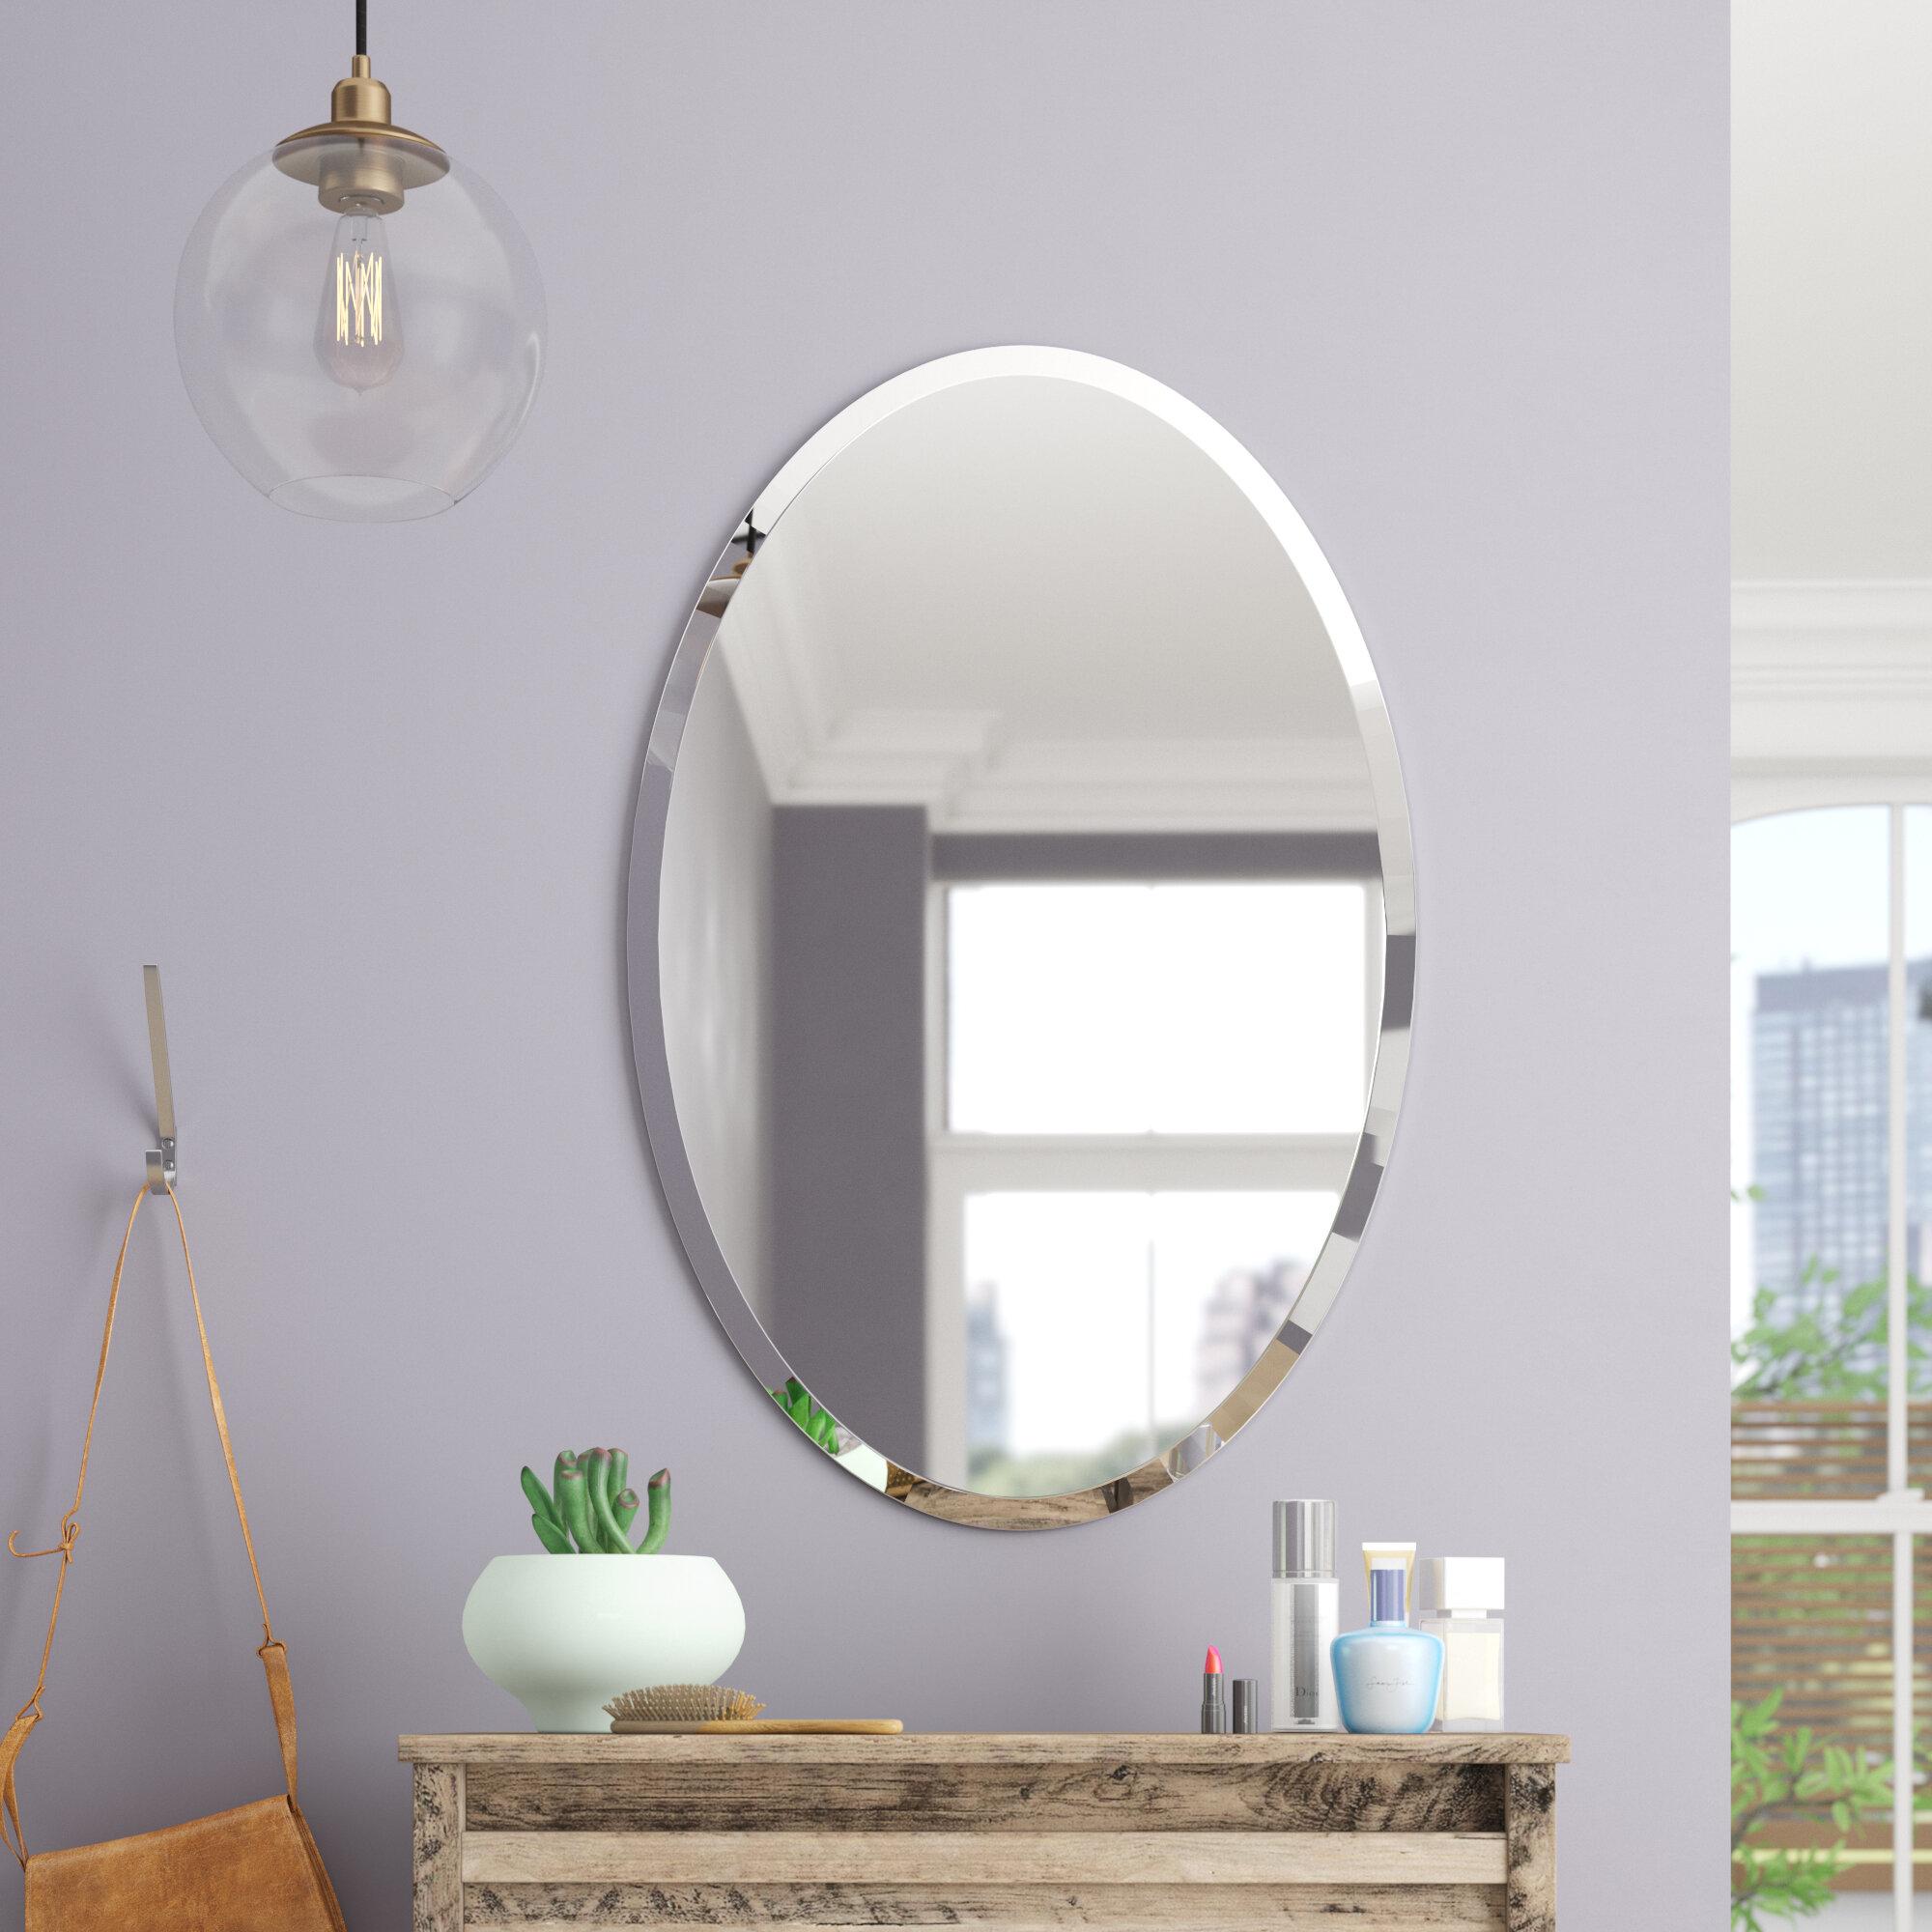 Brayden Studio Thornbury Oval Bevel Frameless Wall Mirror Reviews Wayfair